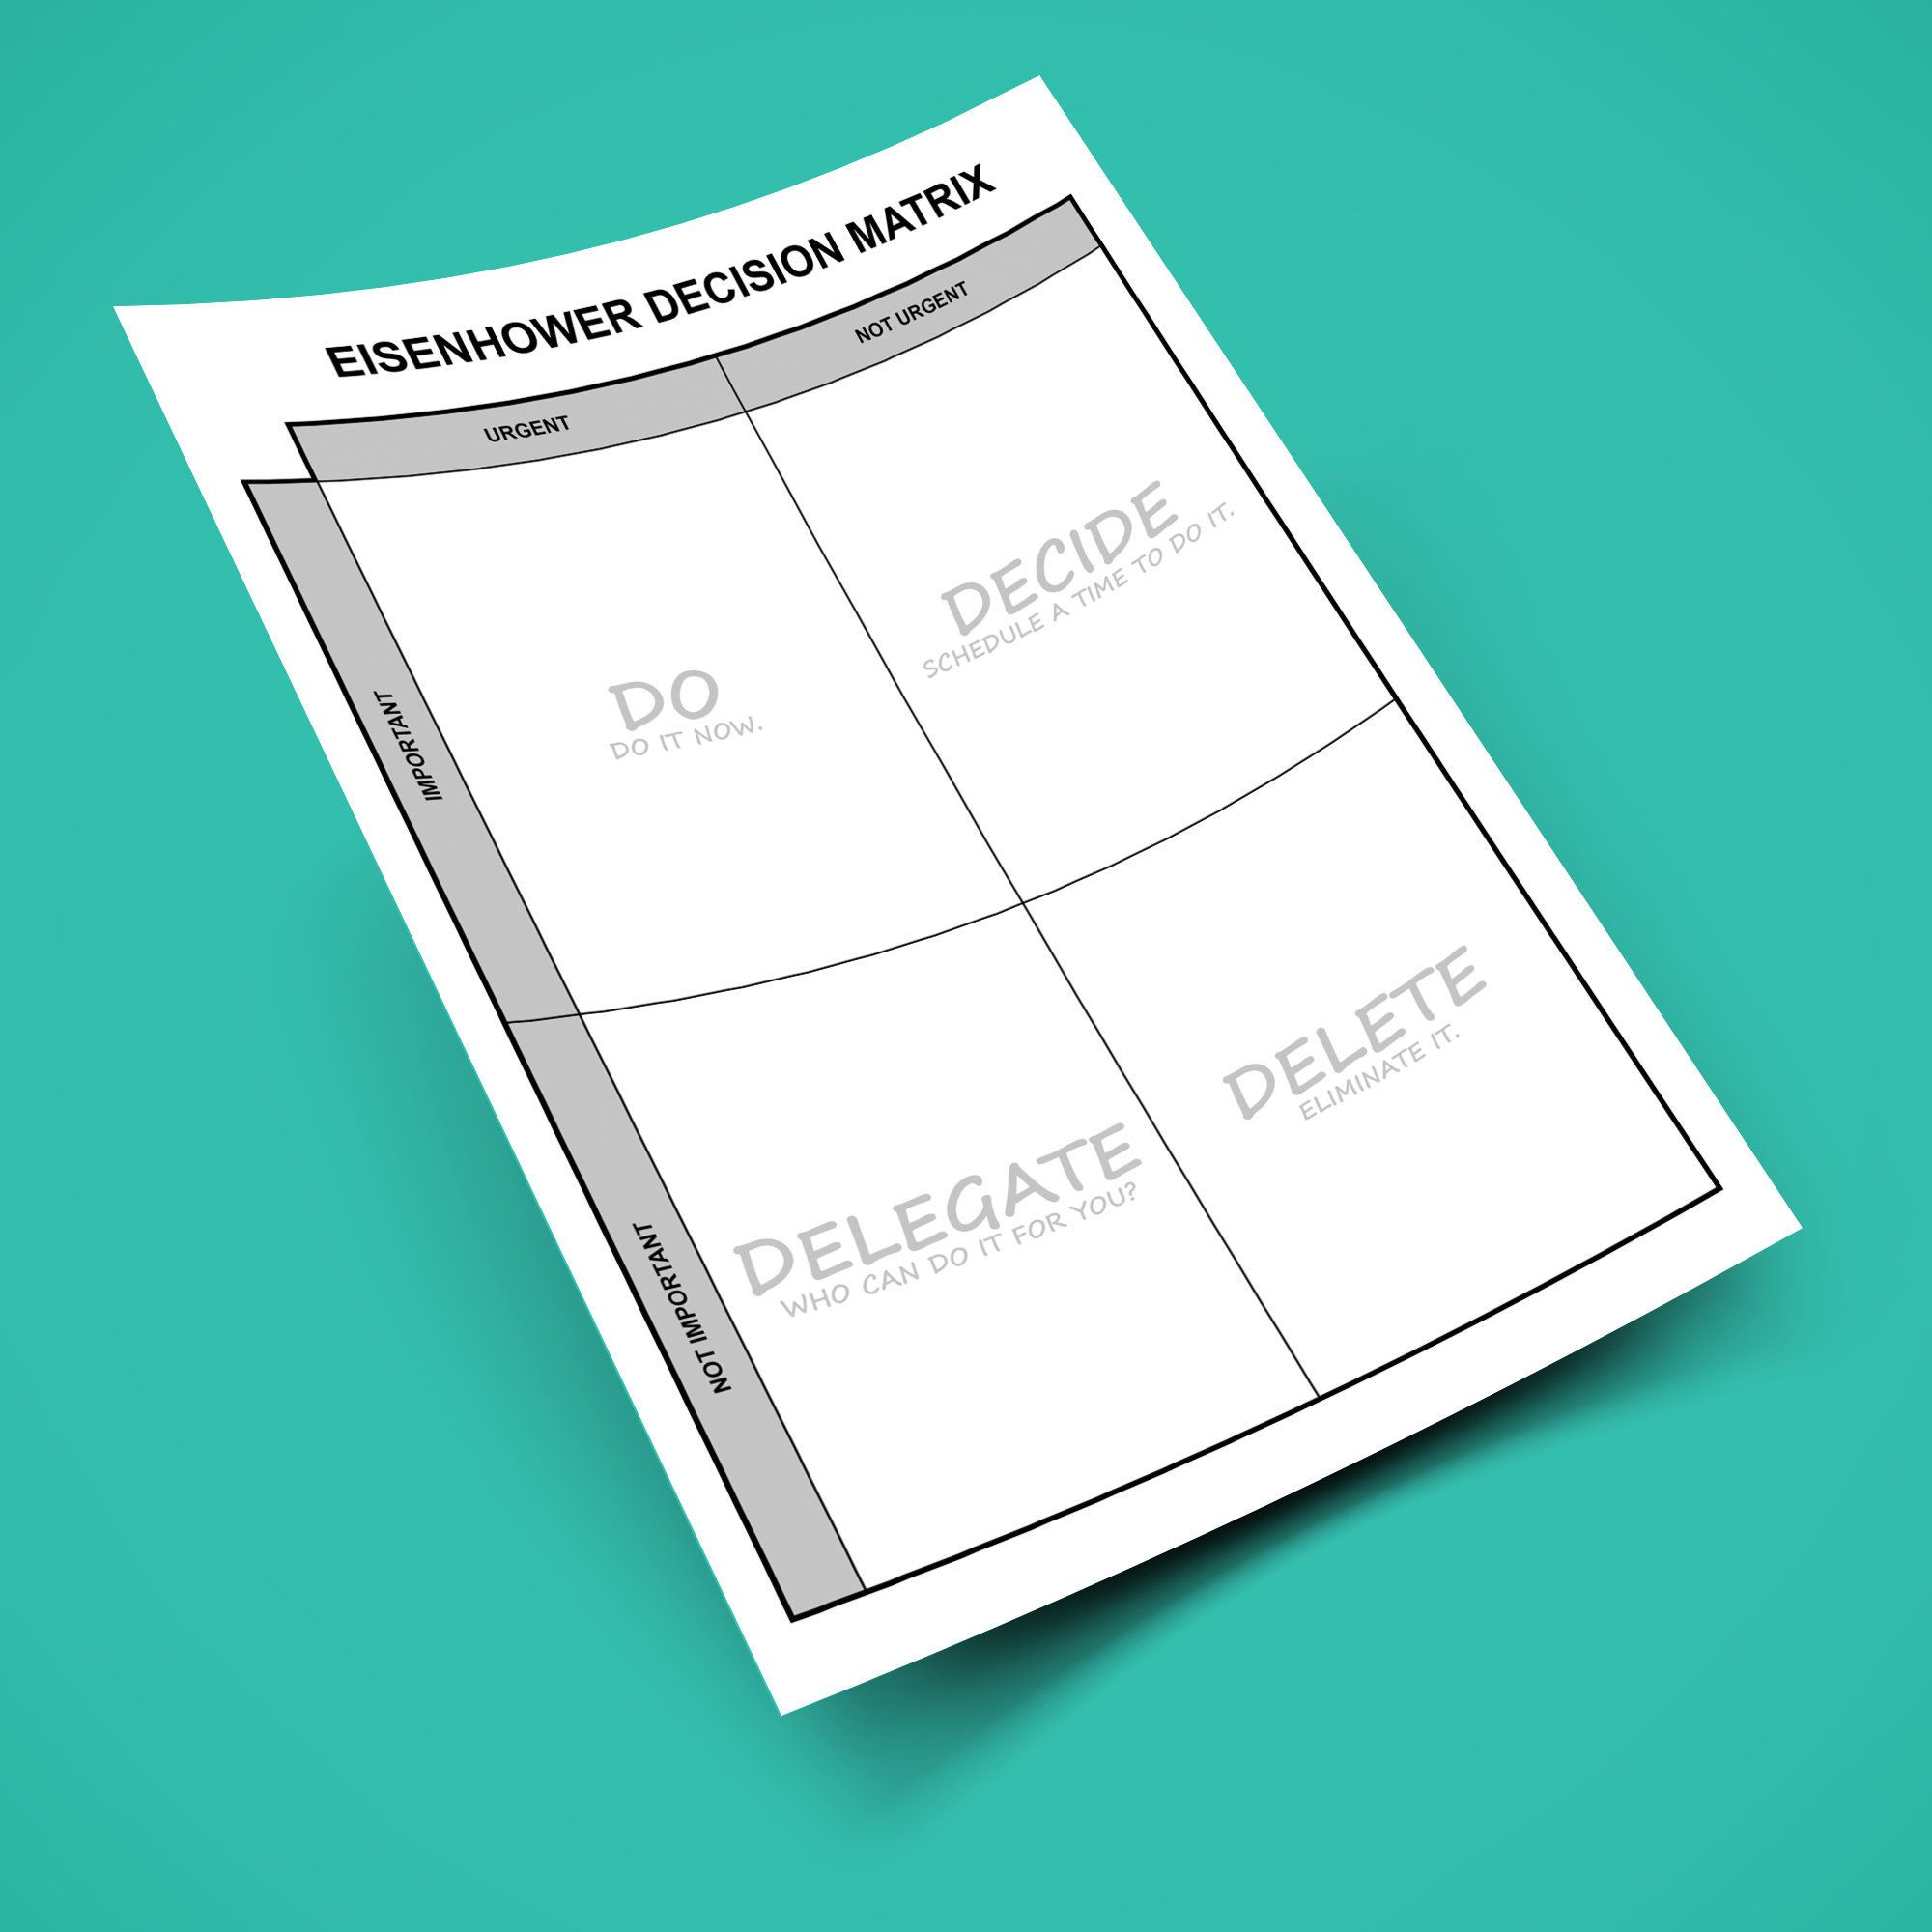 Eisenhower Decision Matrix Editable Printable